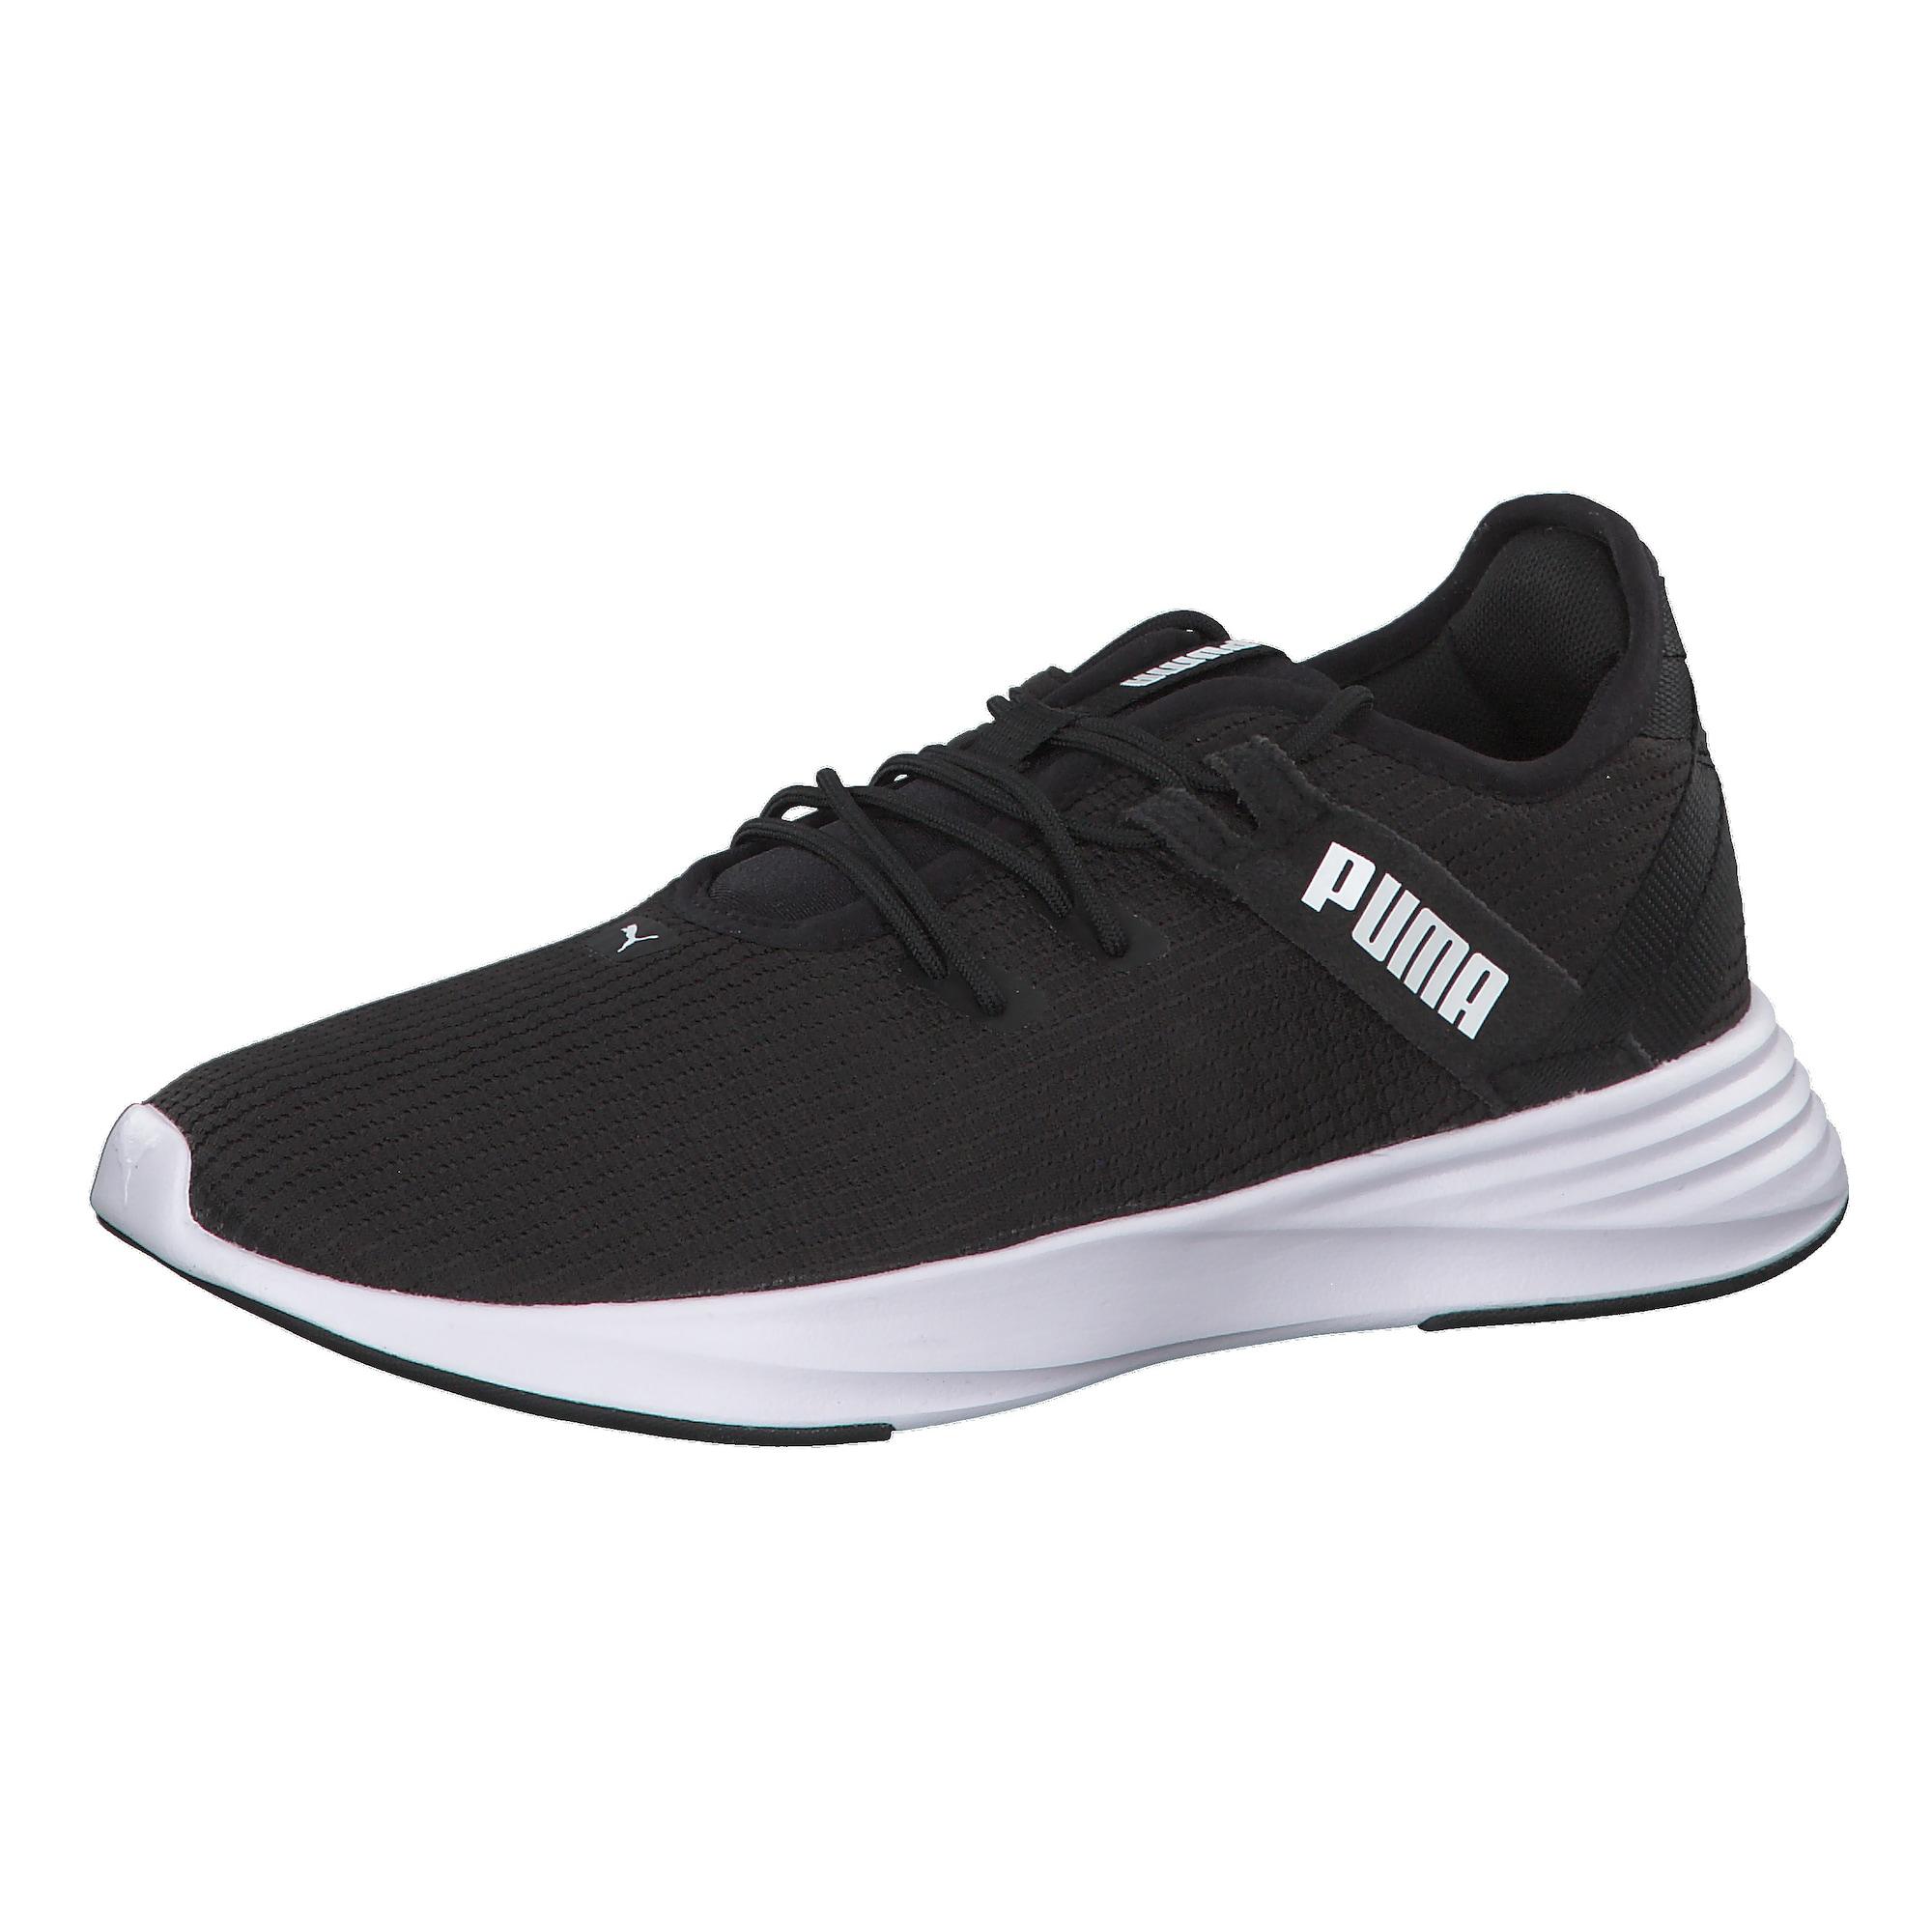 Sportovní boty Radiate XT černá bílá PUMA